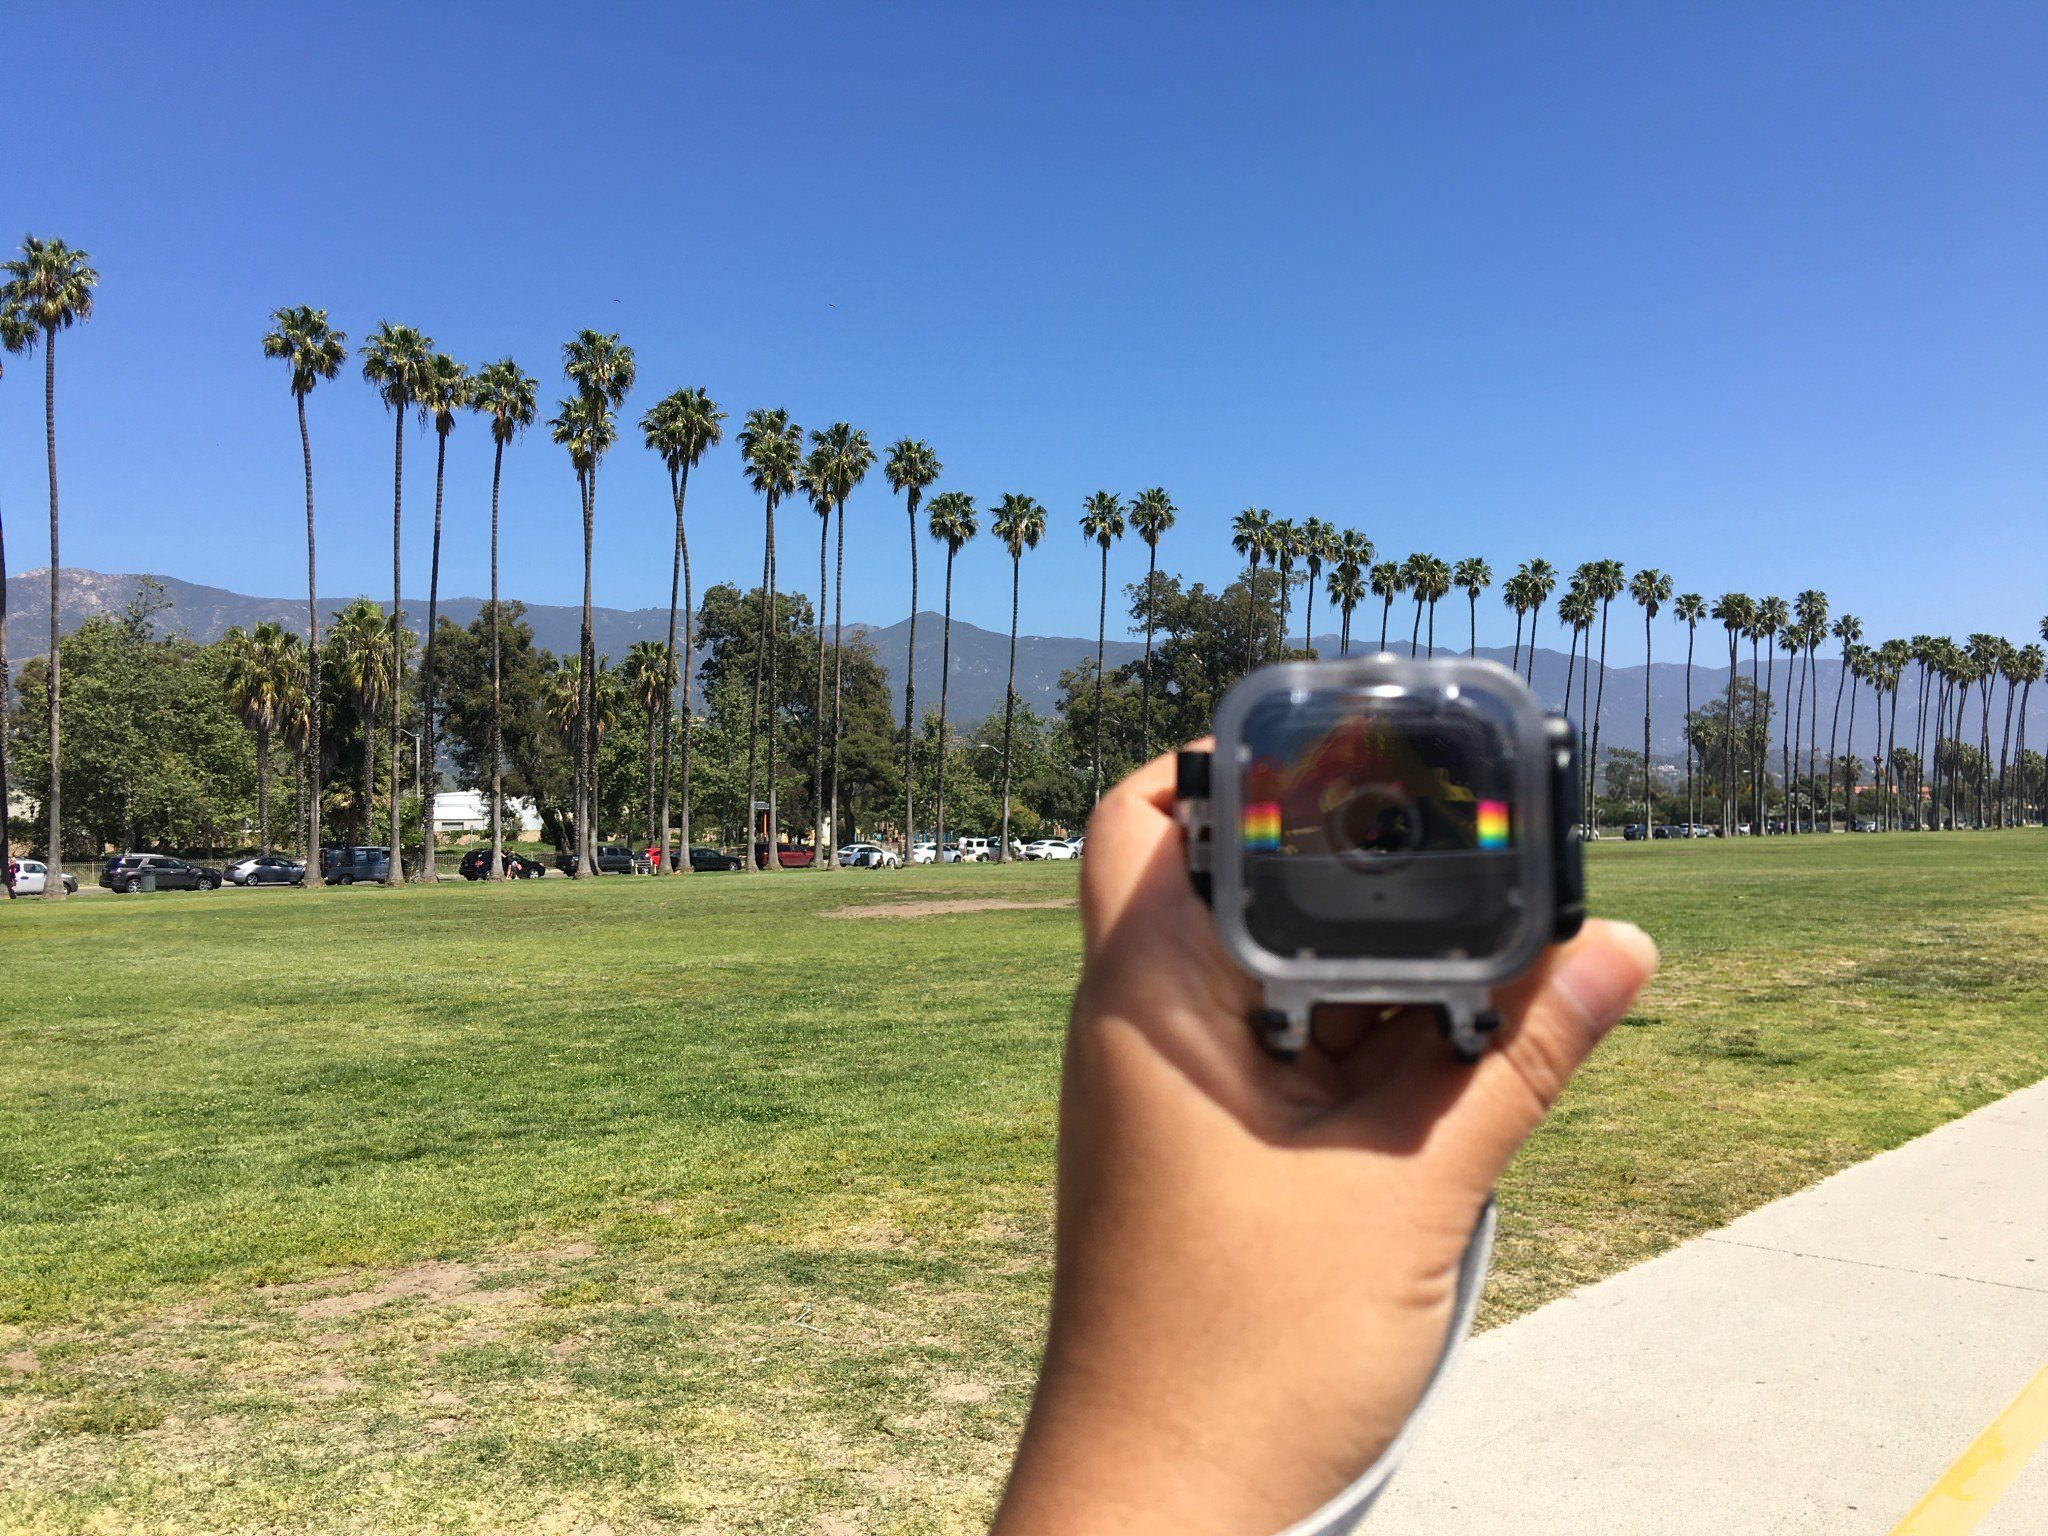 Polaroid Cube Camera - Travel Gadgets of Two Monkeys Travel